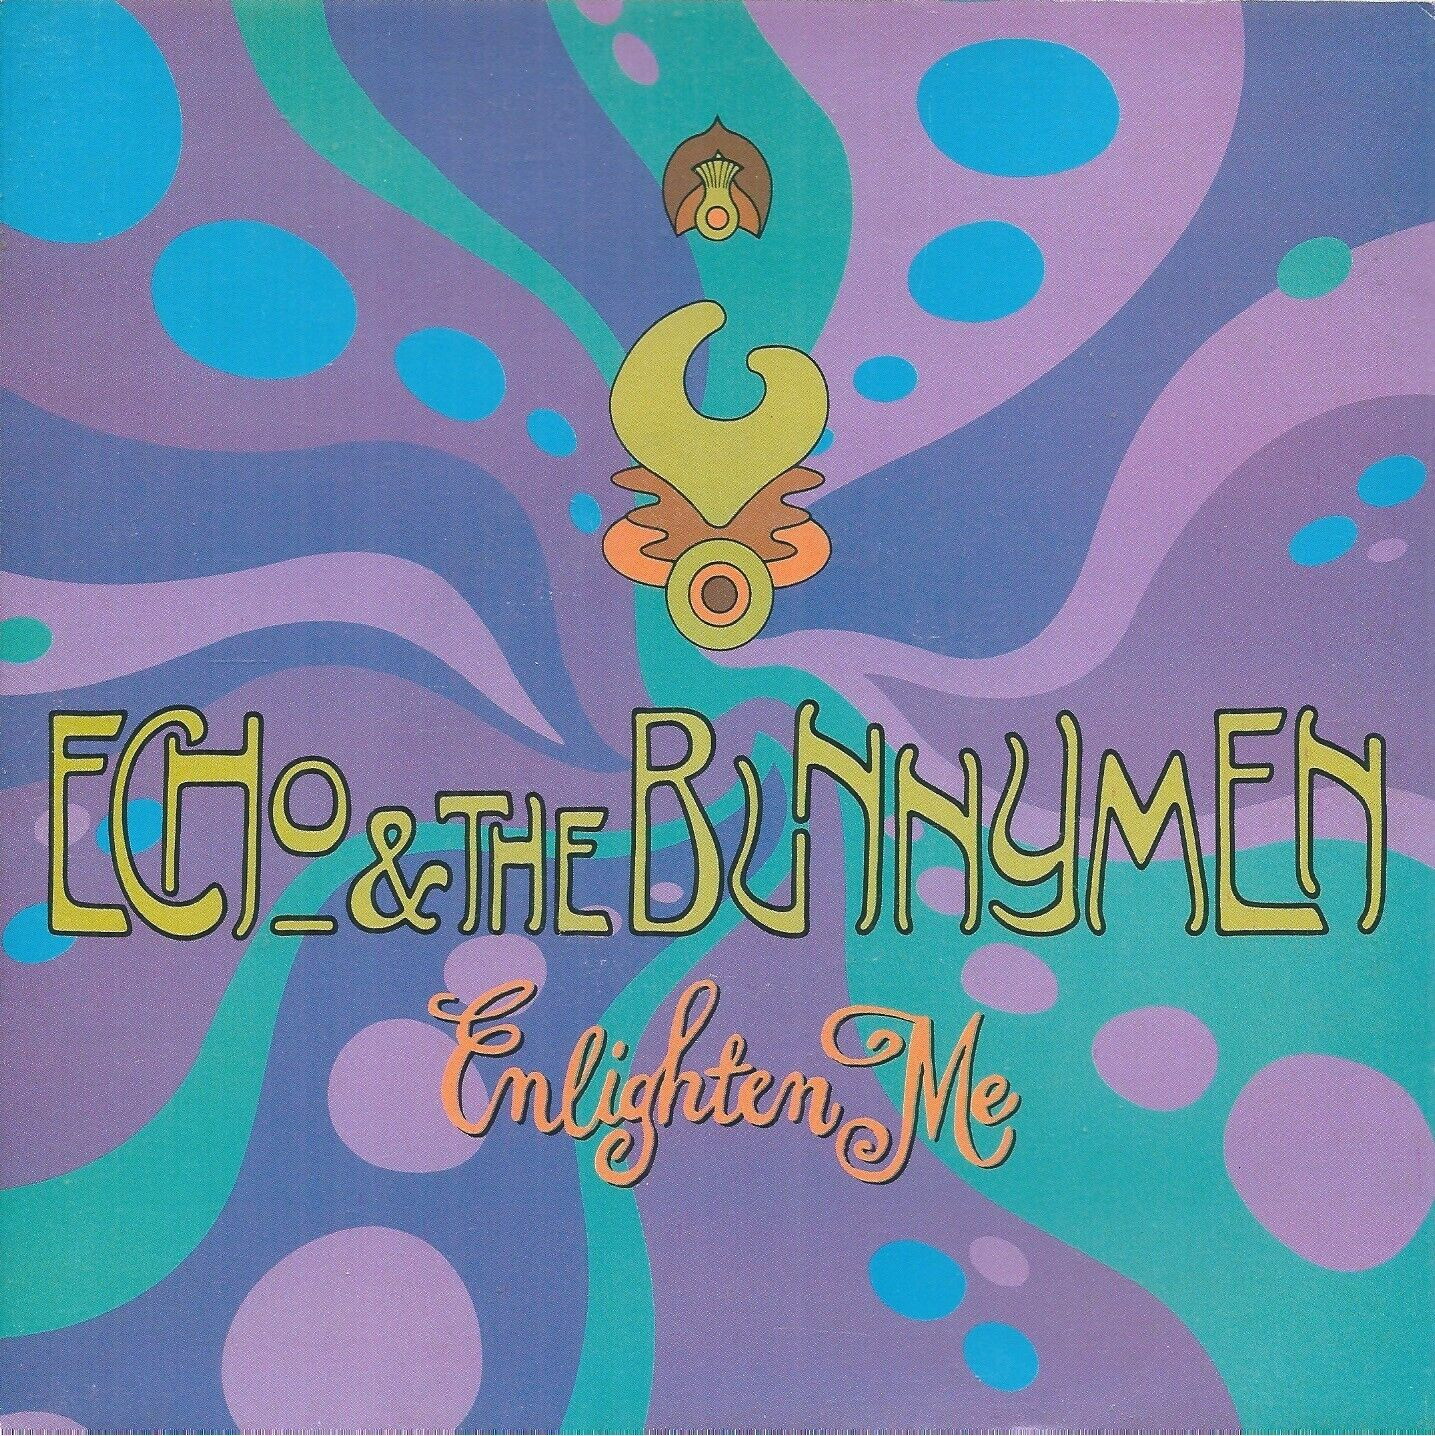 "Echo & The Bunnymen – Enlighten Me  7"" Vinyl 45rpm P/S Ex Con"